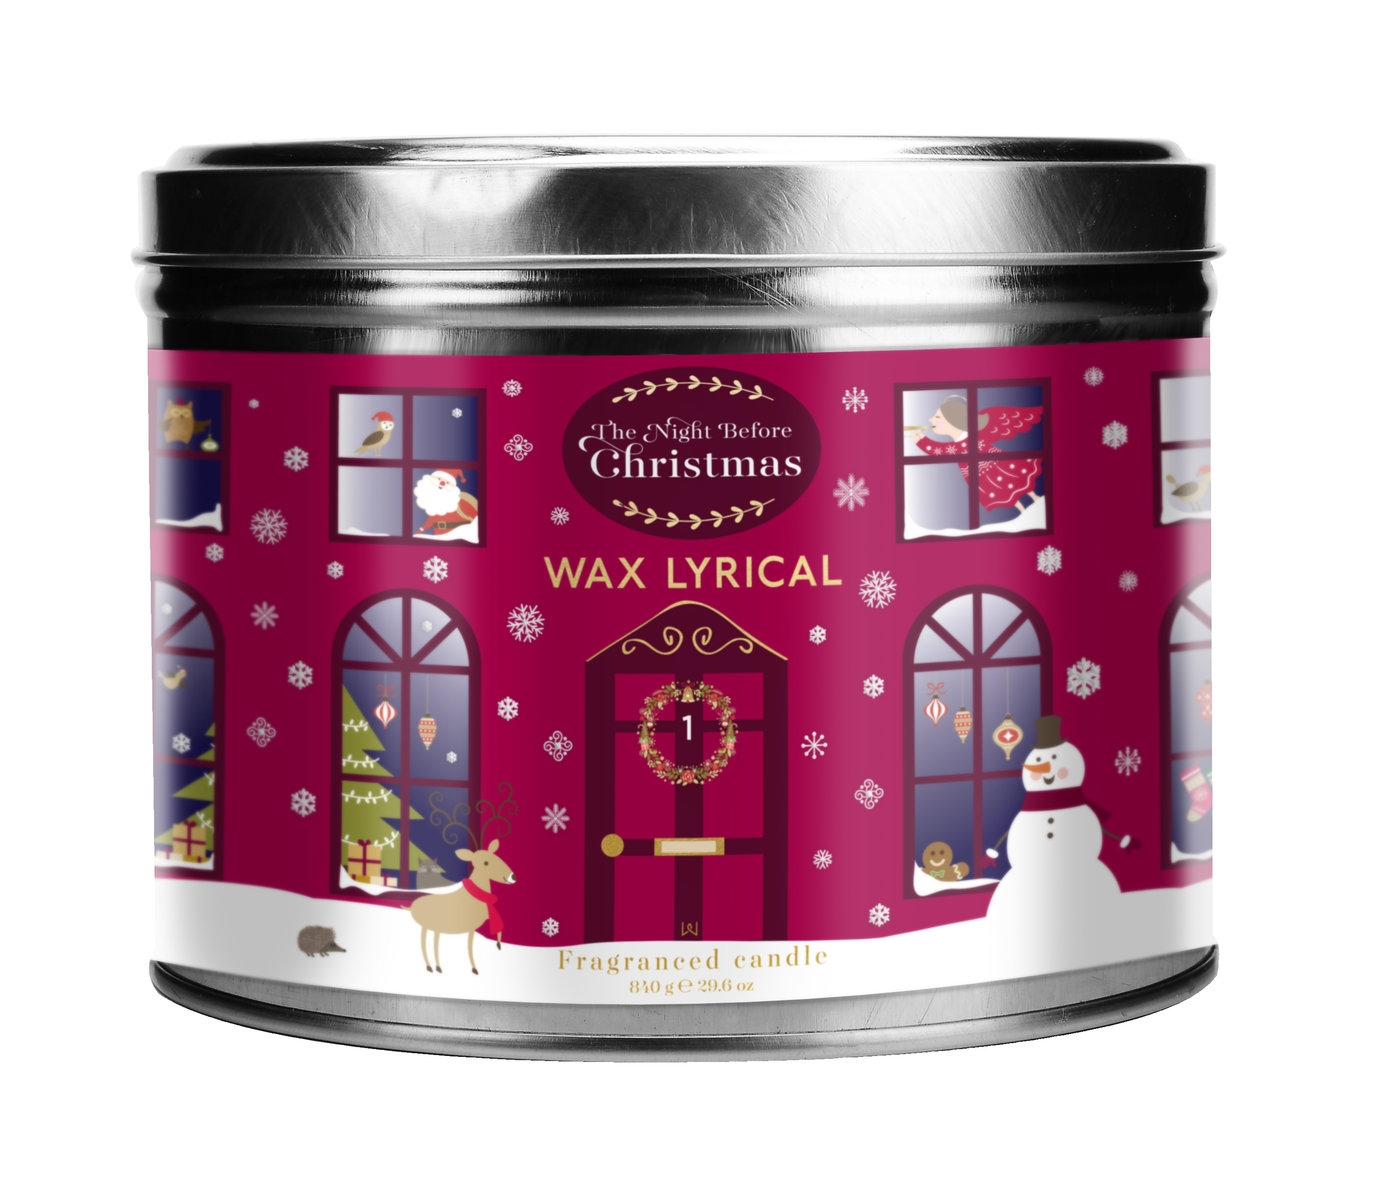 Wax Lyrical The Night Before Christmas